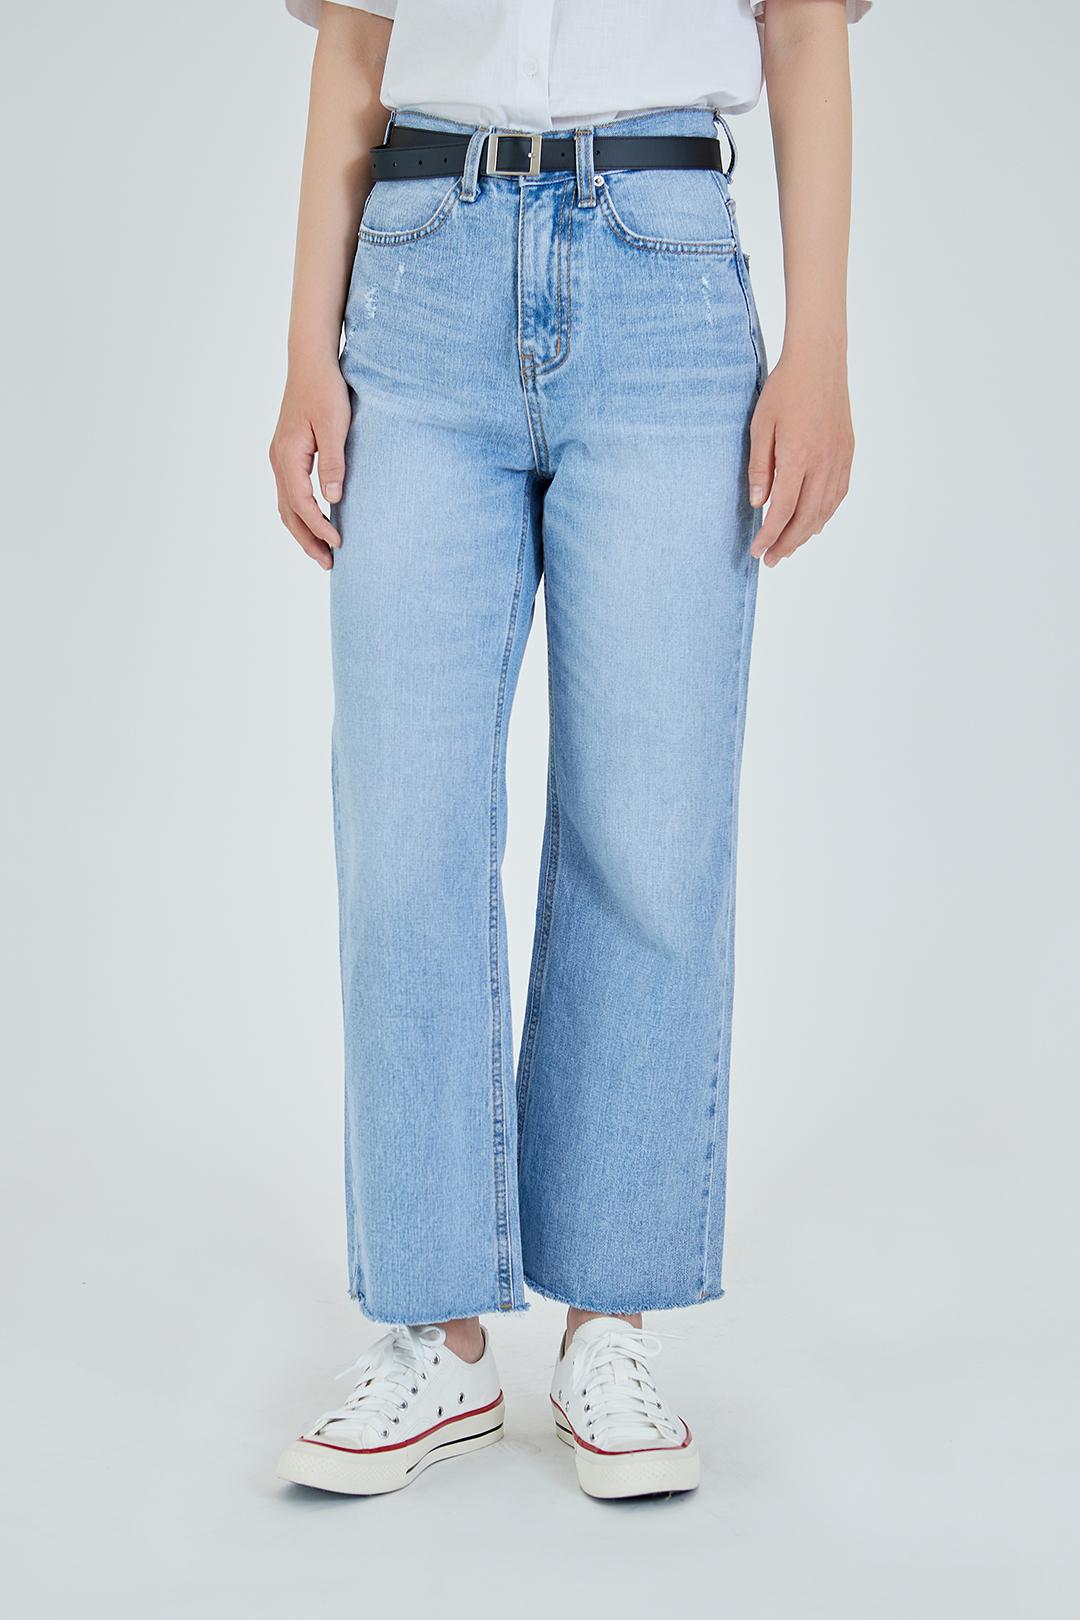 ESSAYRaw Hem Wide Leg Jeans